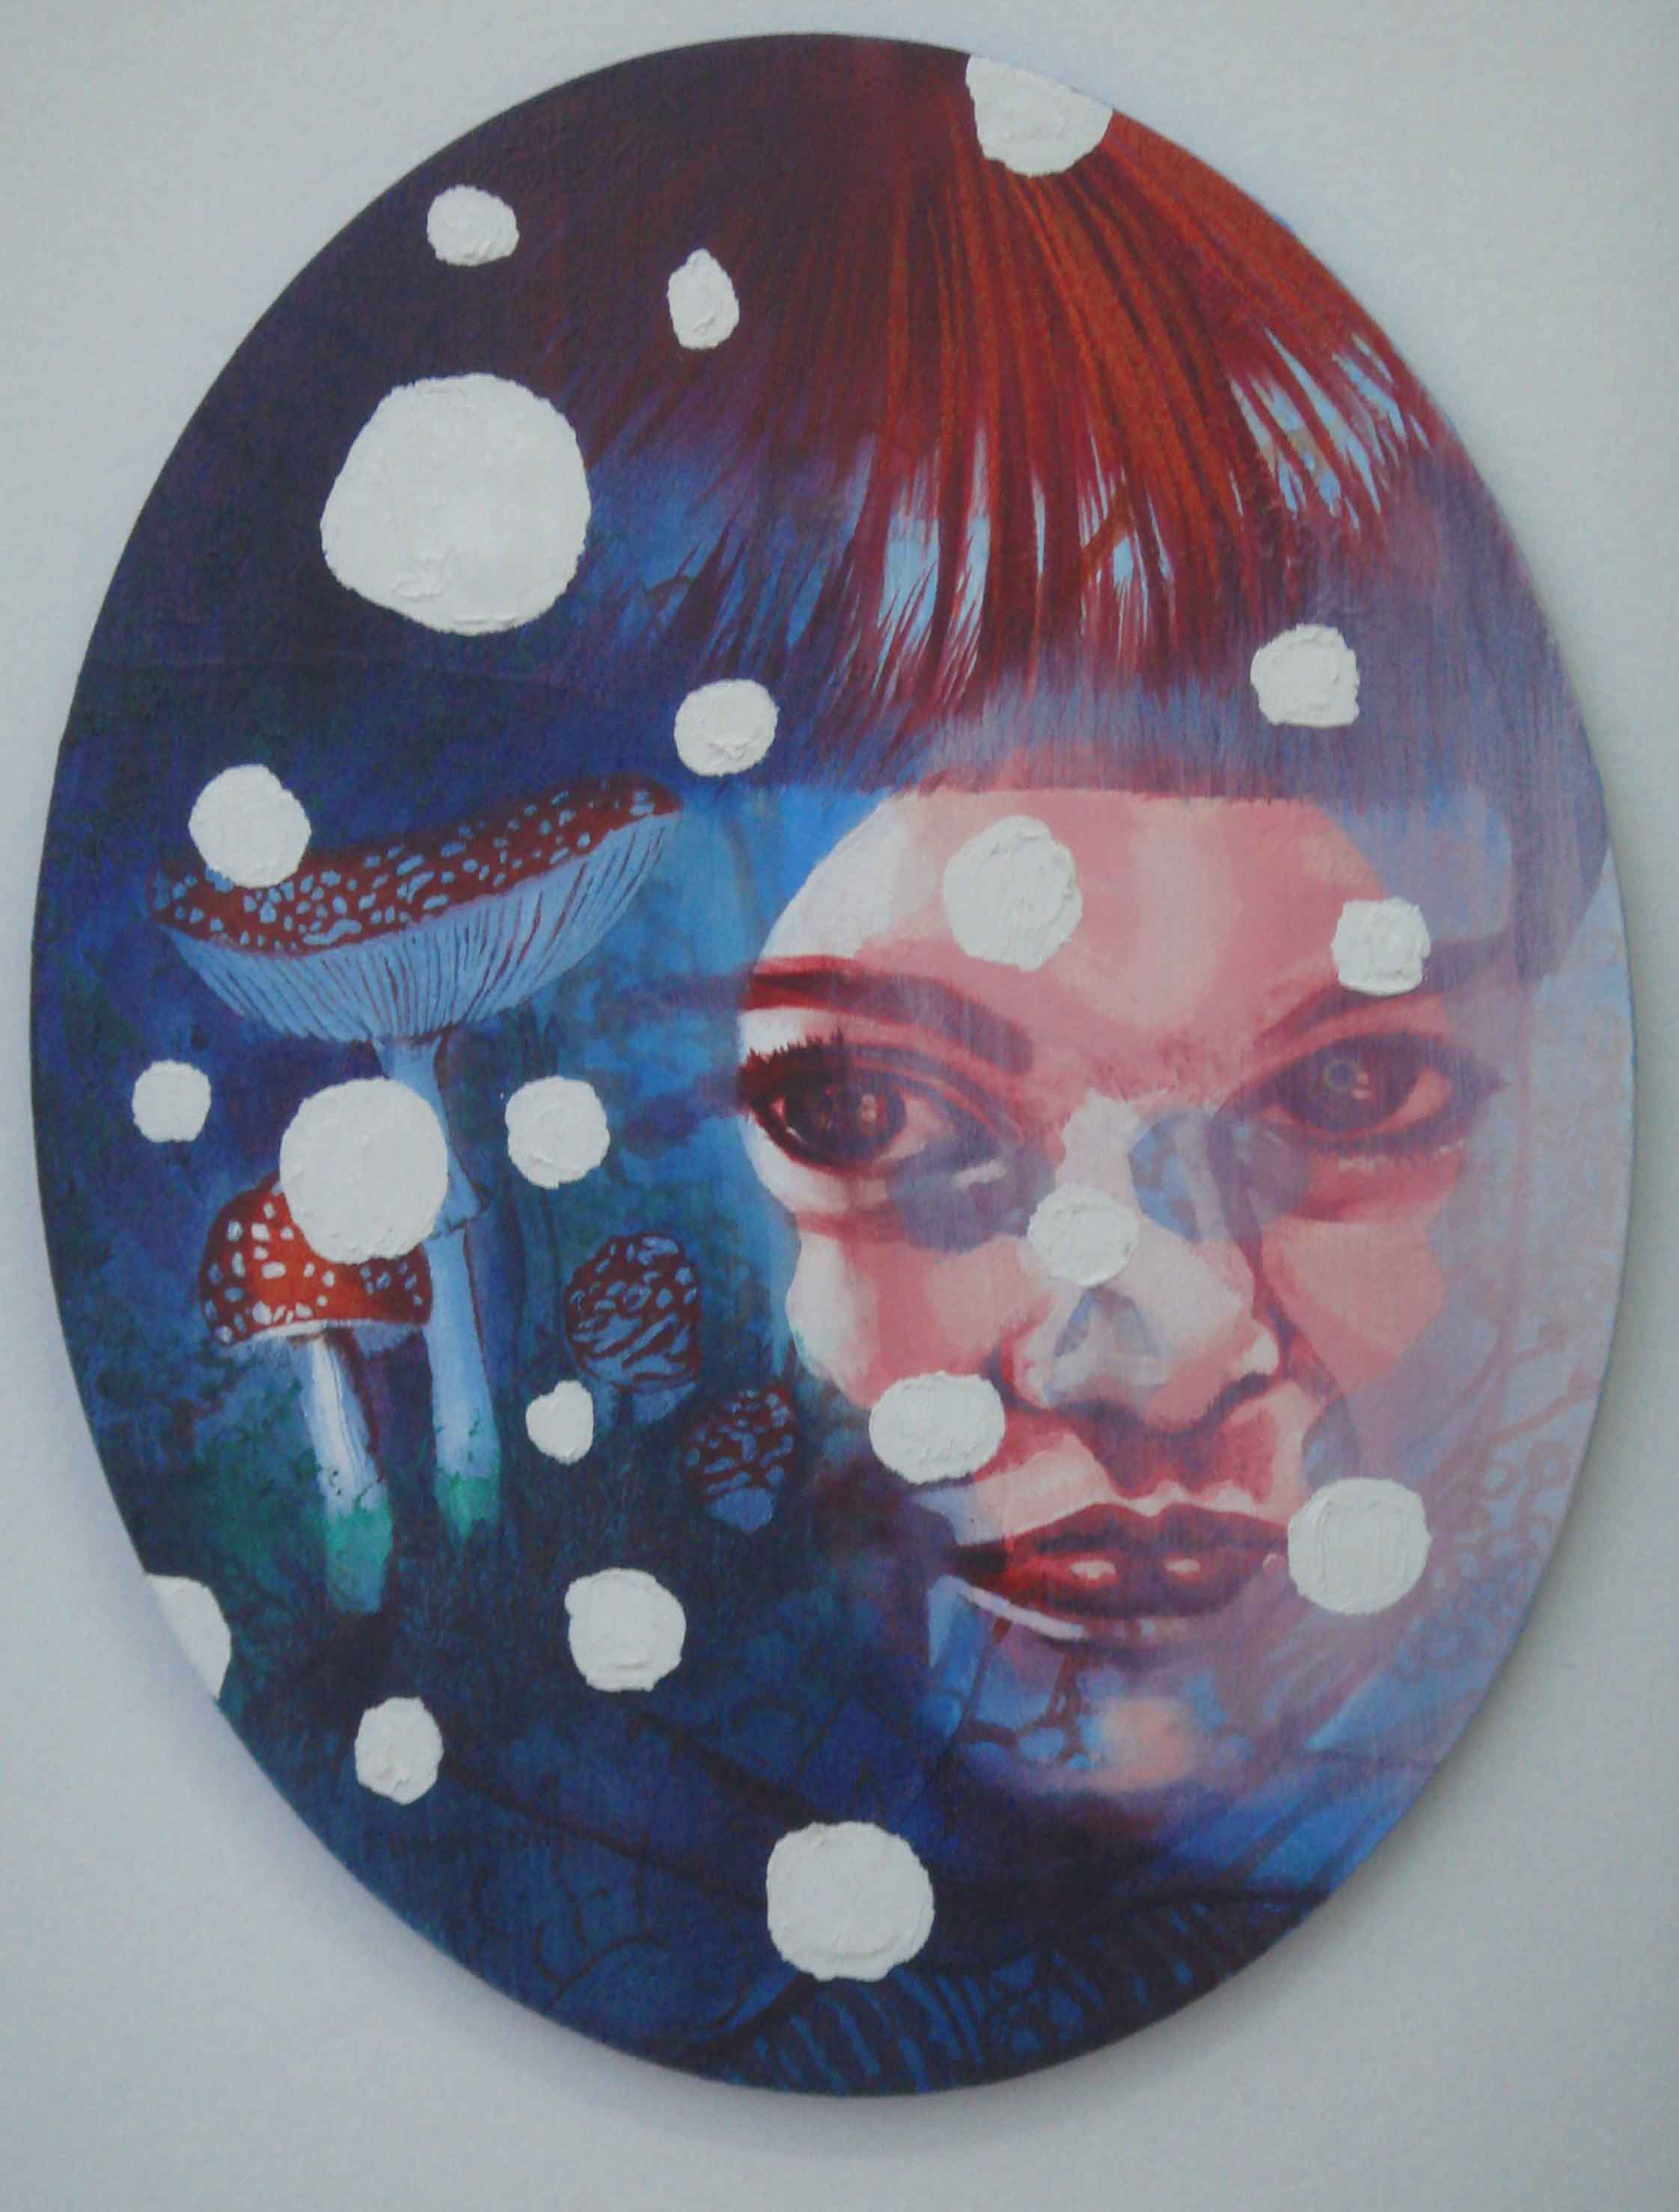 NANA OHNESORGE  Fliegenpilz  2007 fabric, glue, acrylic ink, acrylic & oil on canvas 51 ×40 cm